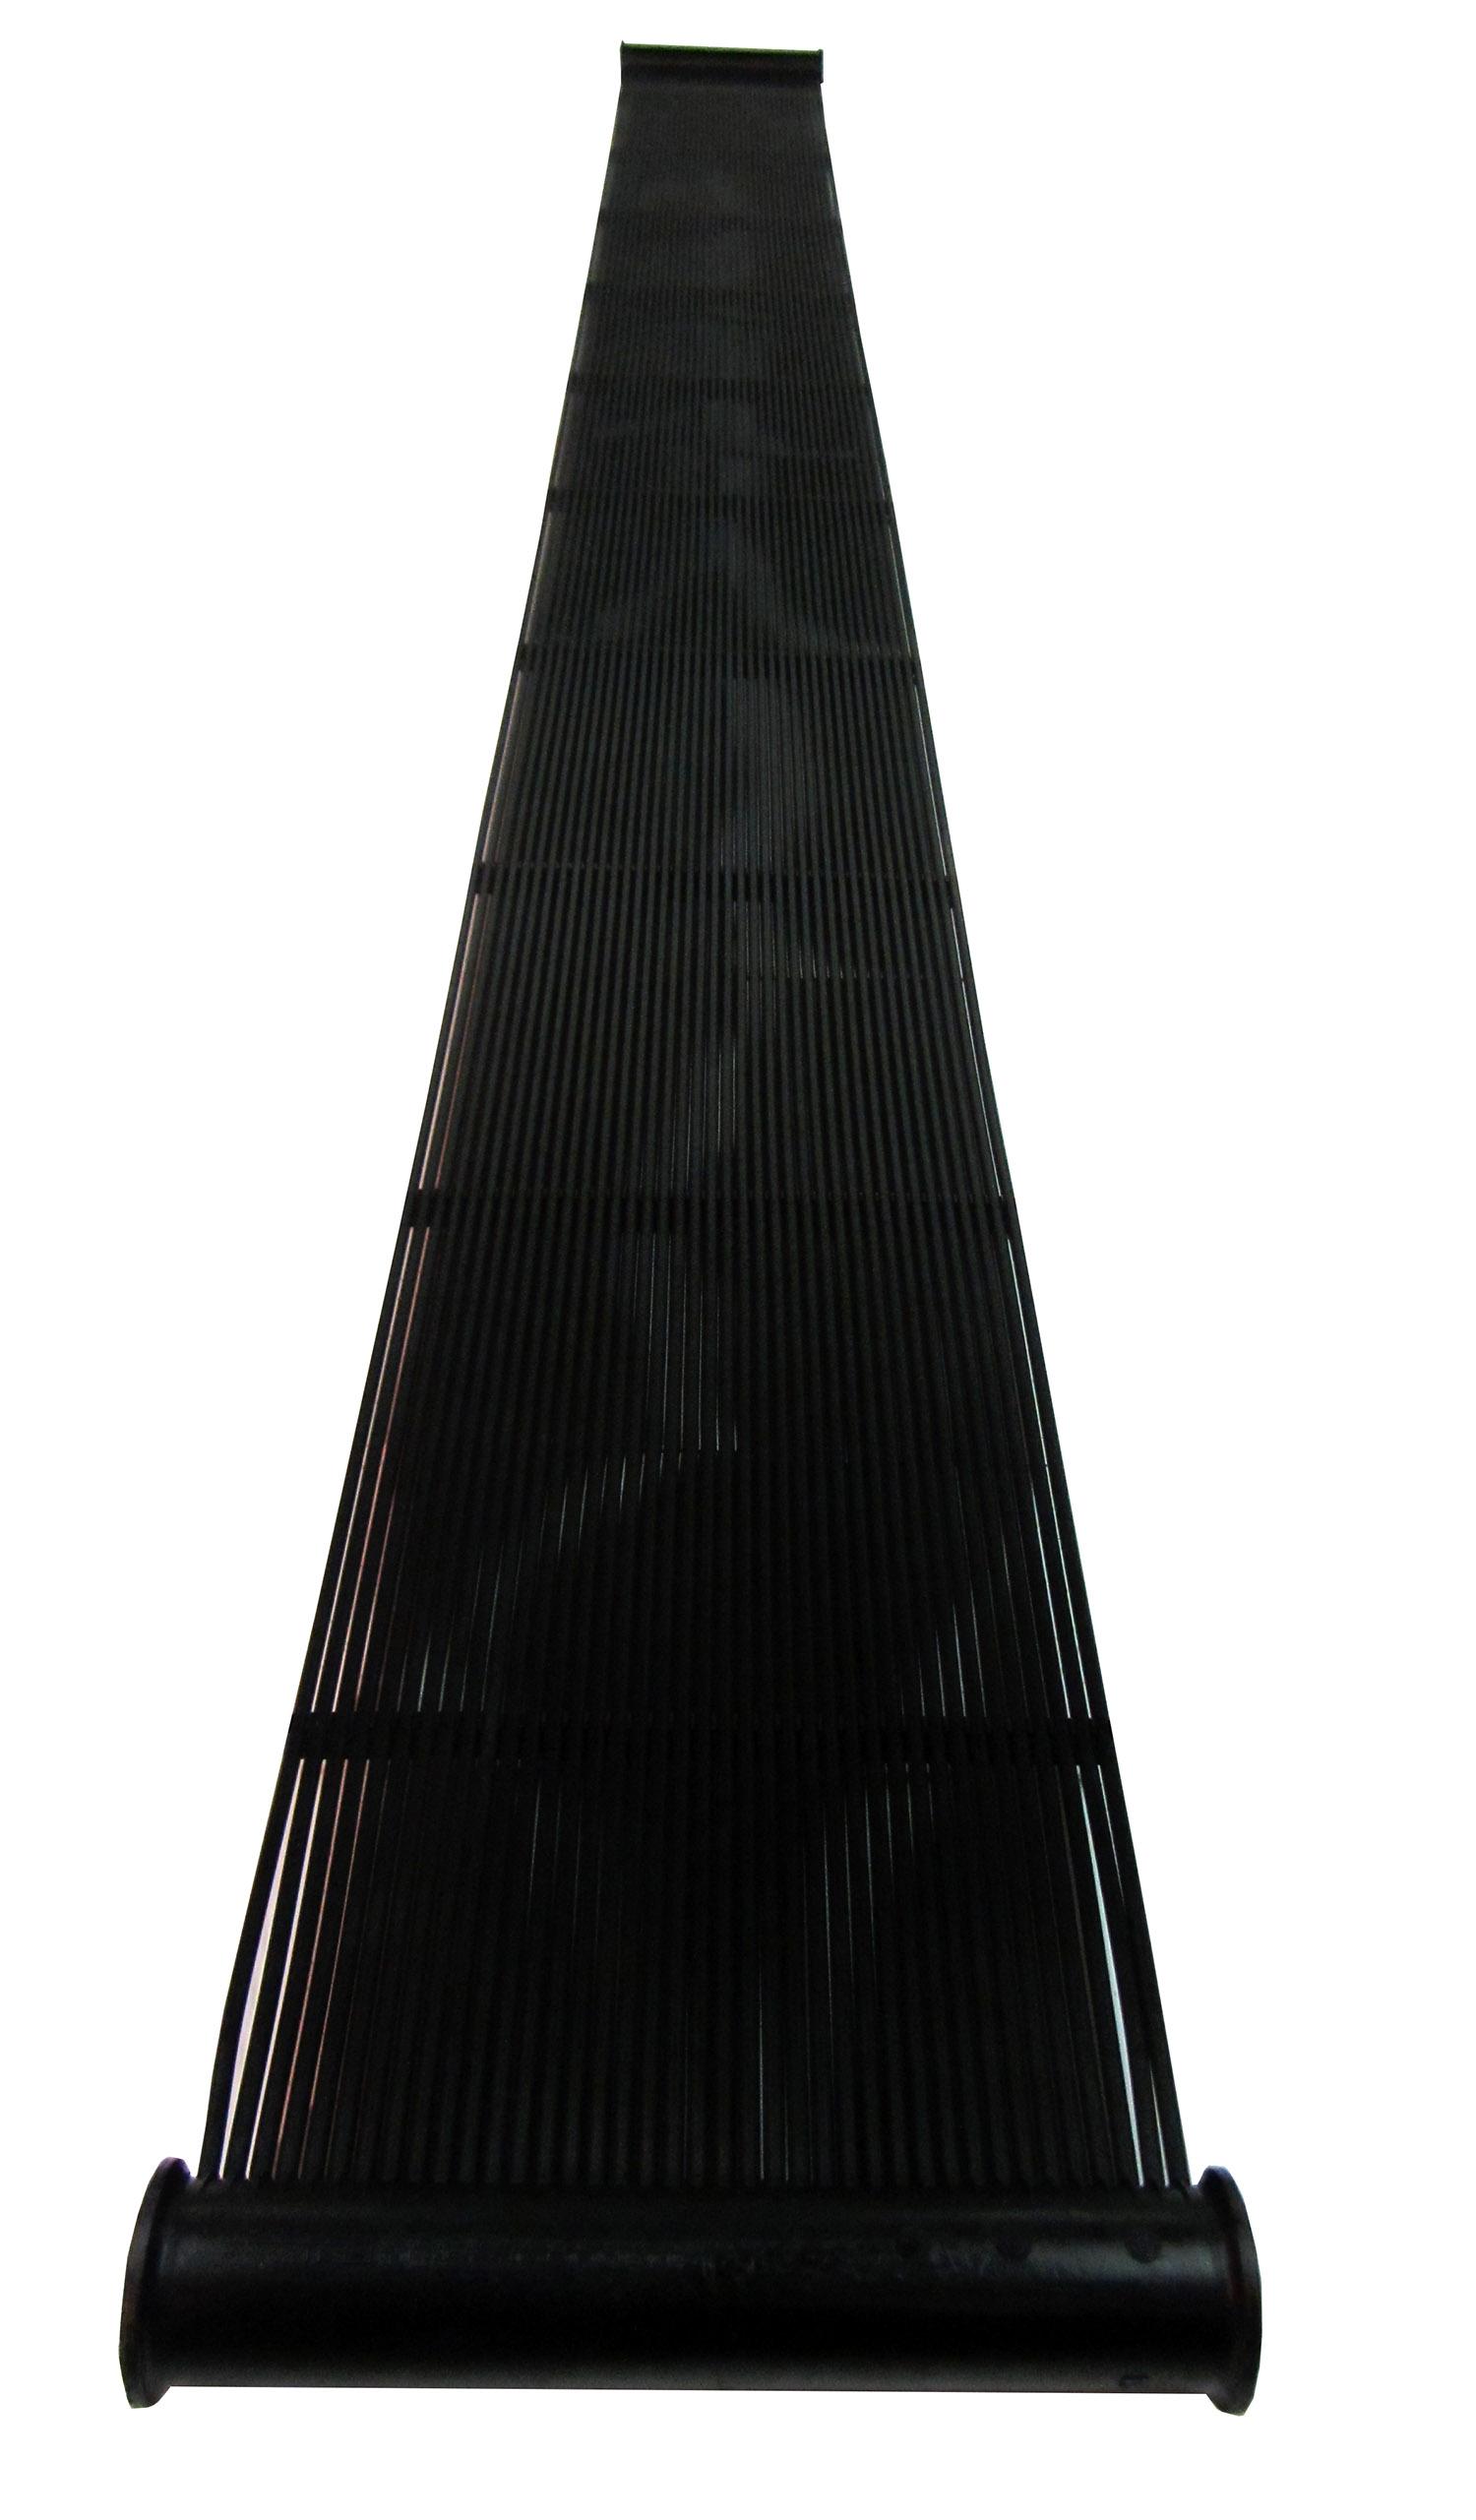 Heliocol Swimming Pool Solar Heating Panel 1 39 X 10 39 6 Hc 10 5 Ebay